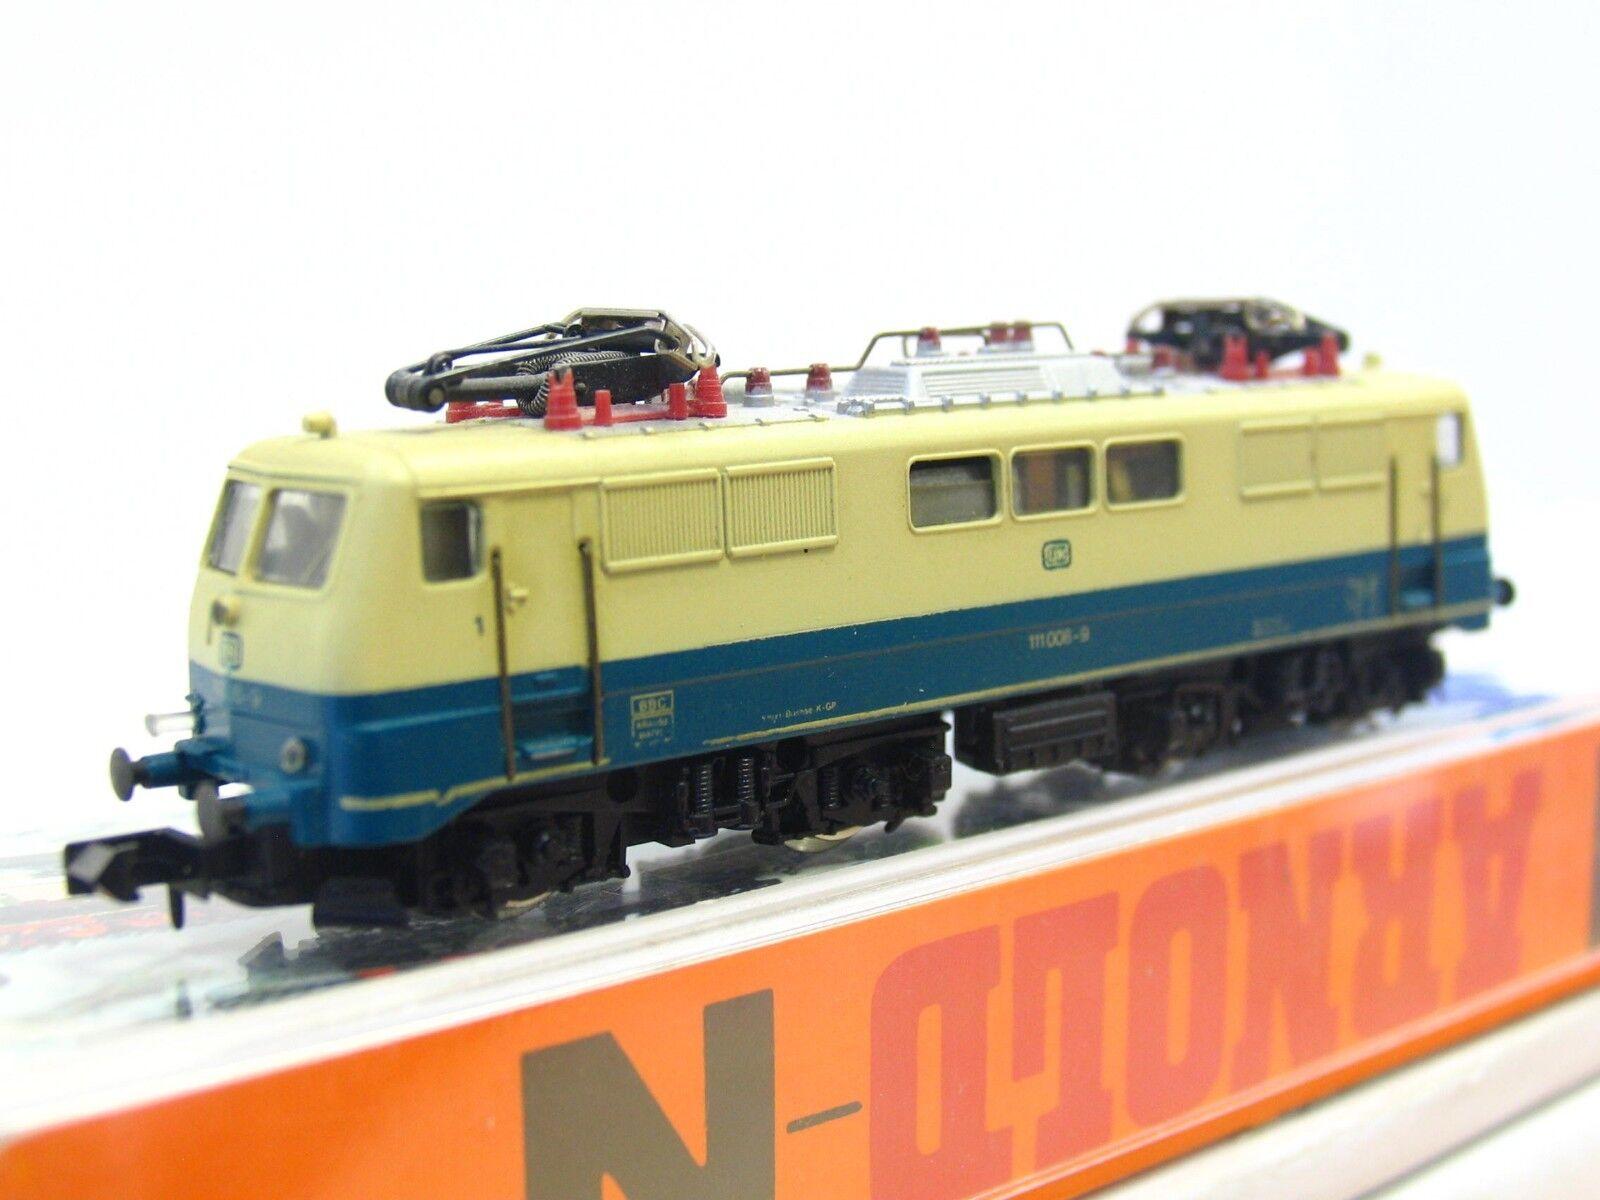 Arnold n 2325 e-Lok br 111 008-9 DB embalaje original (v6427)